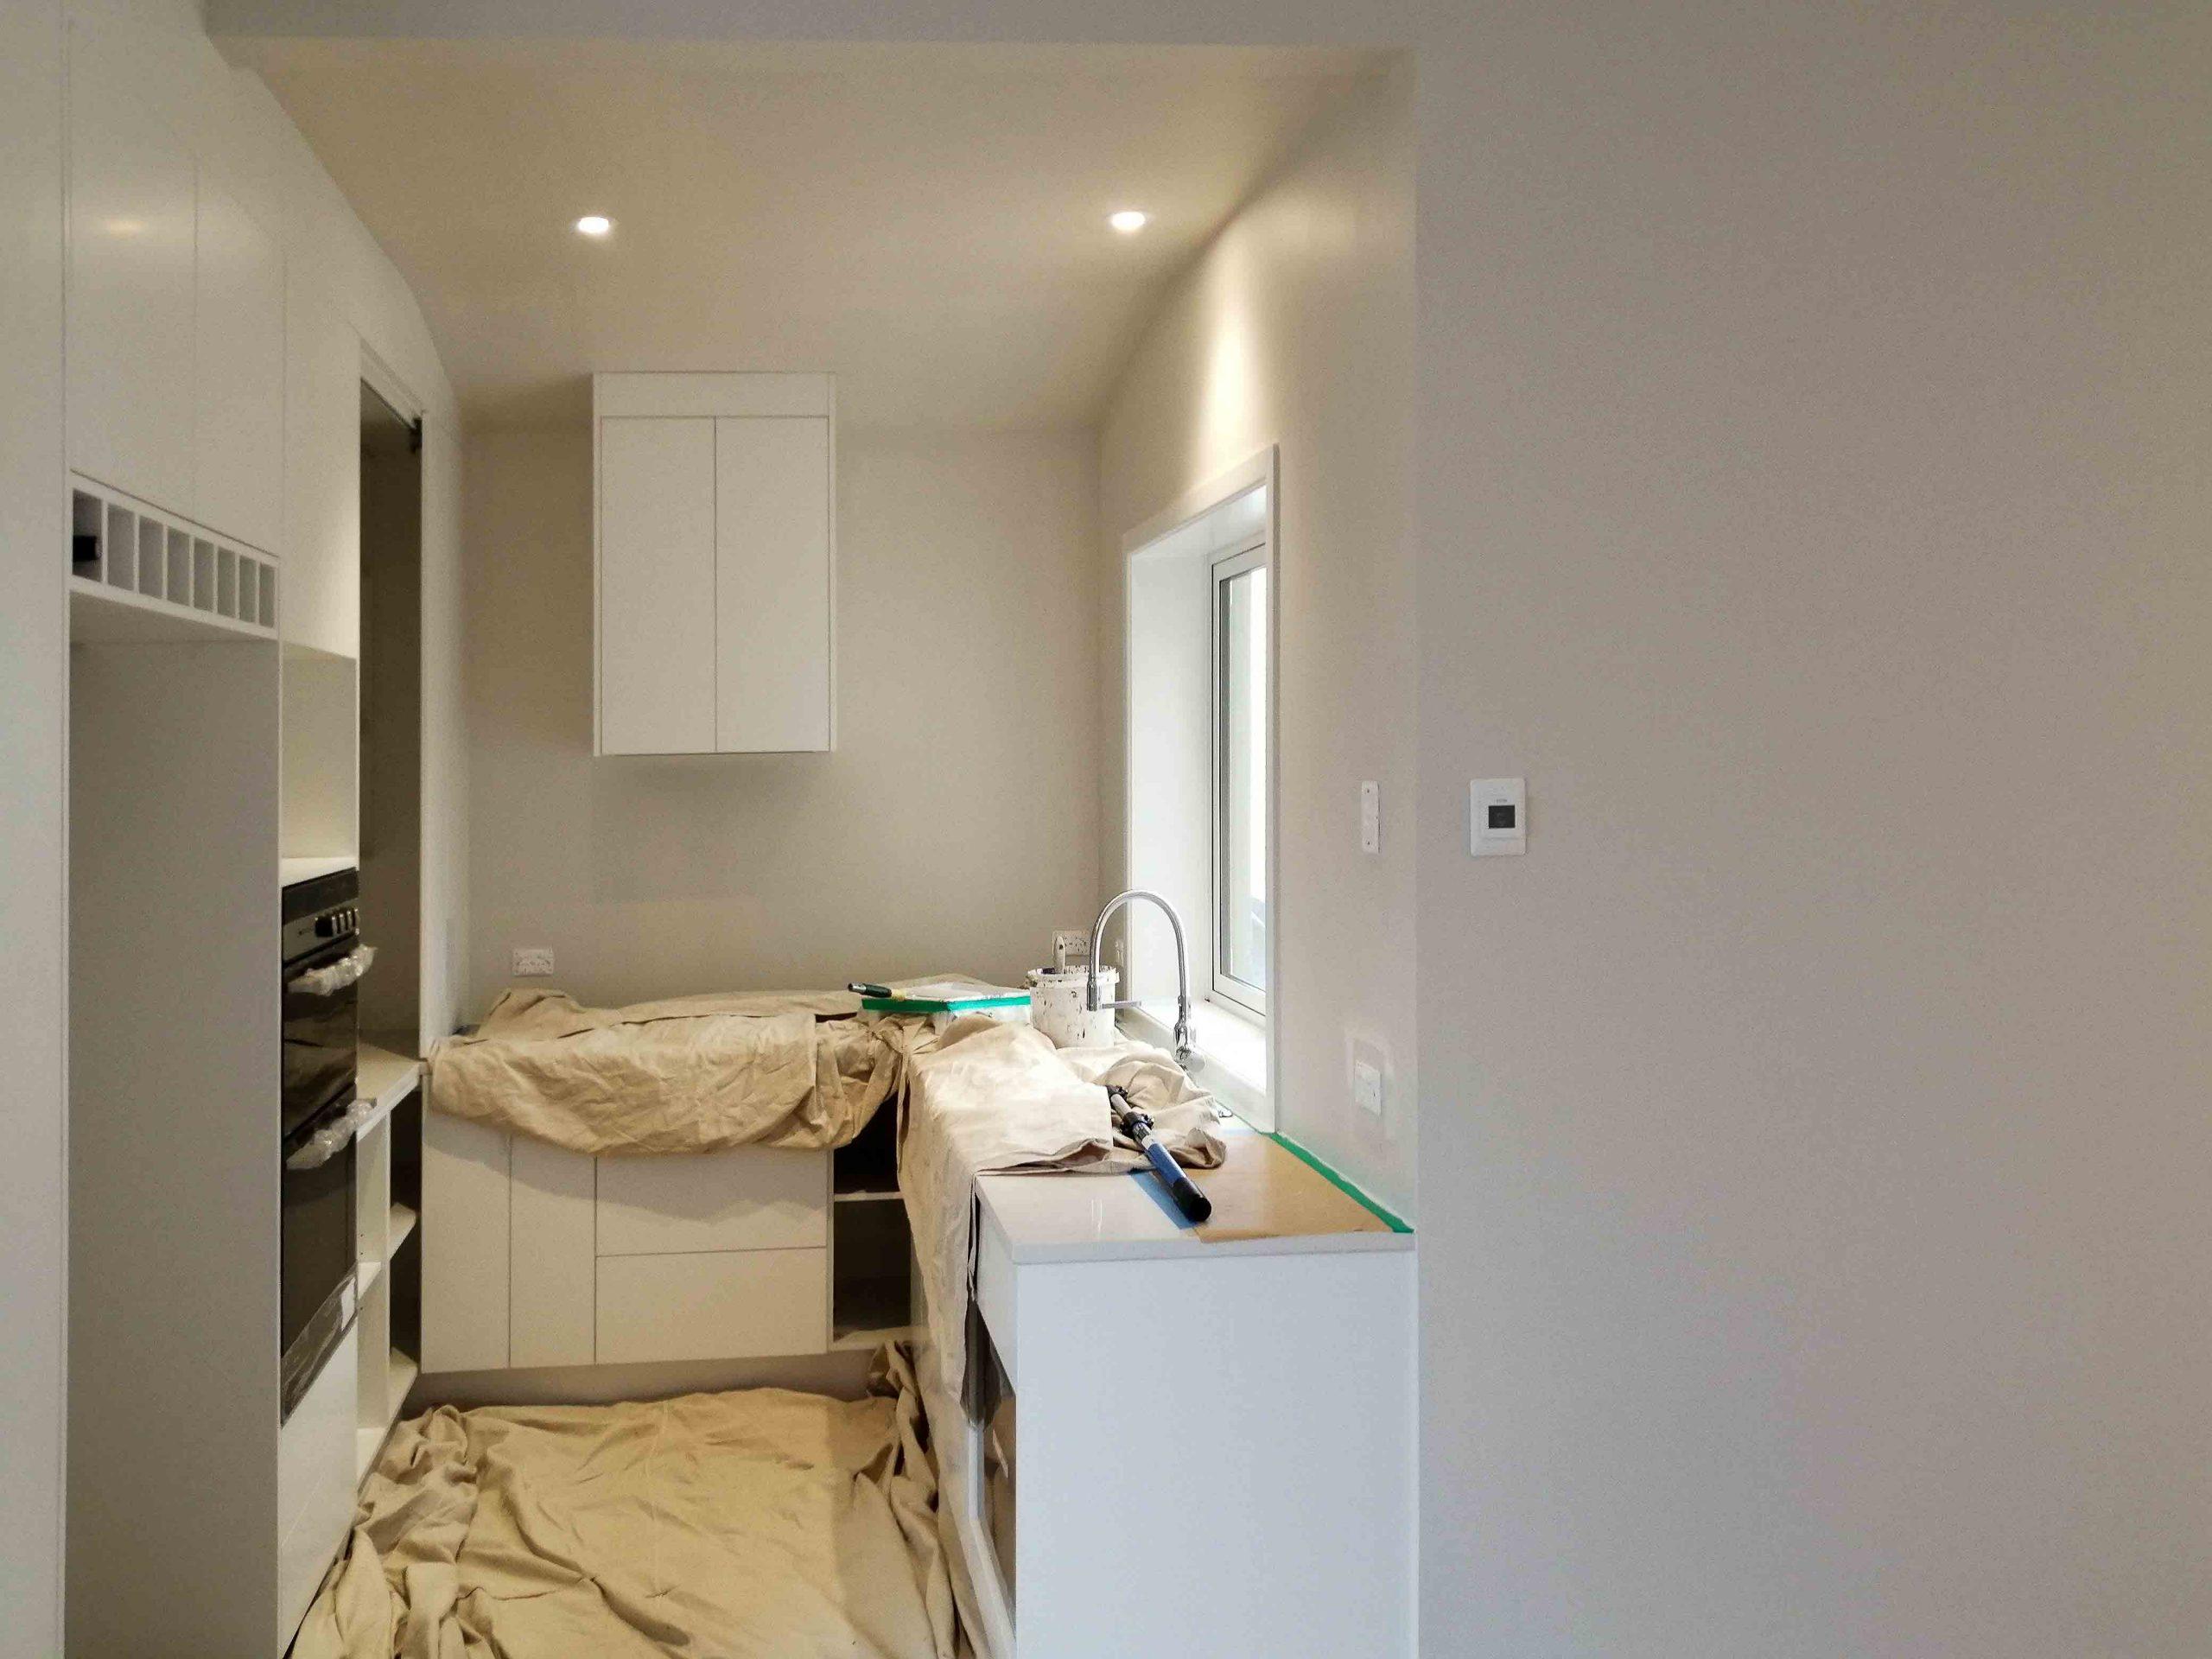 Kitchen interior painting Auckland